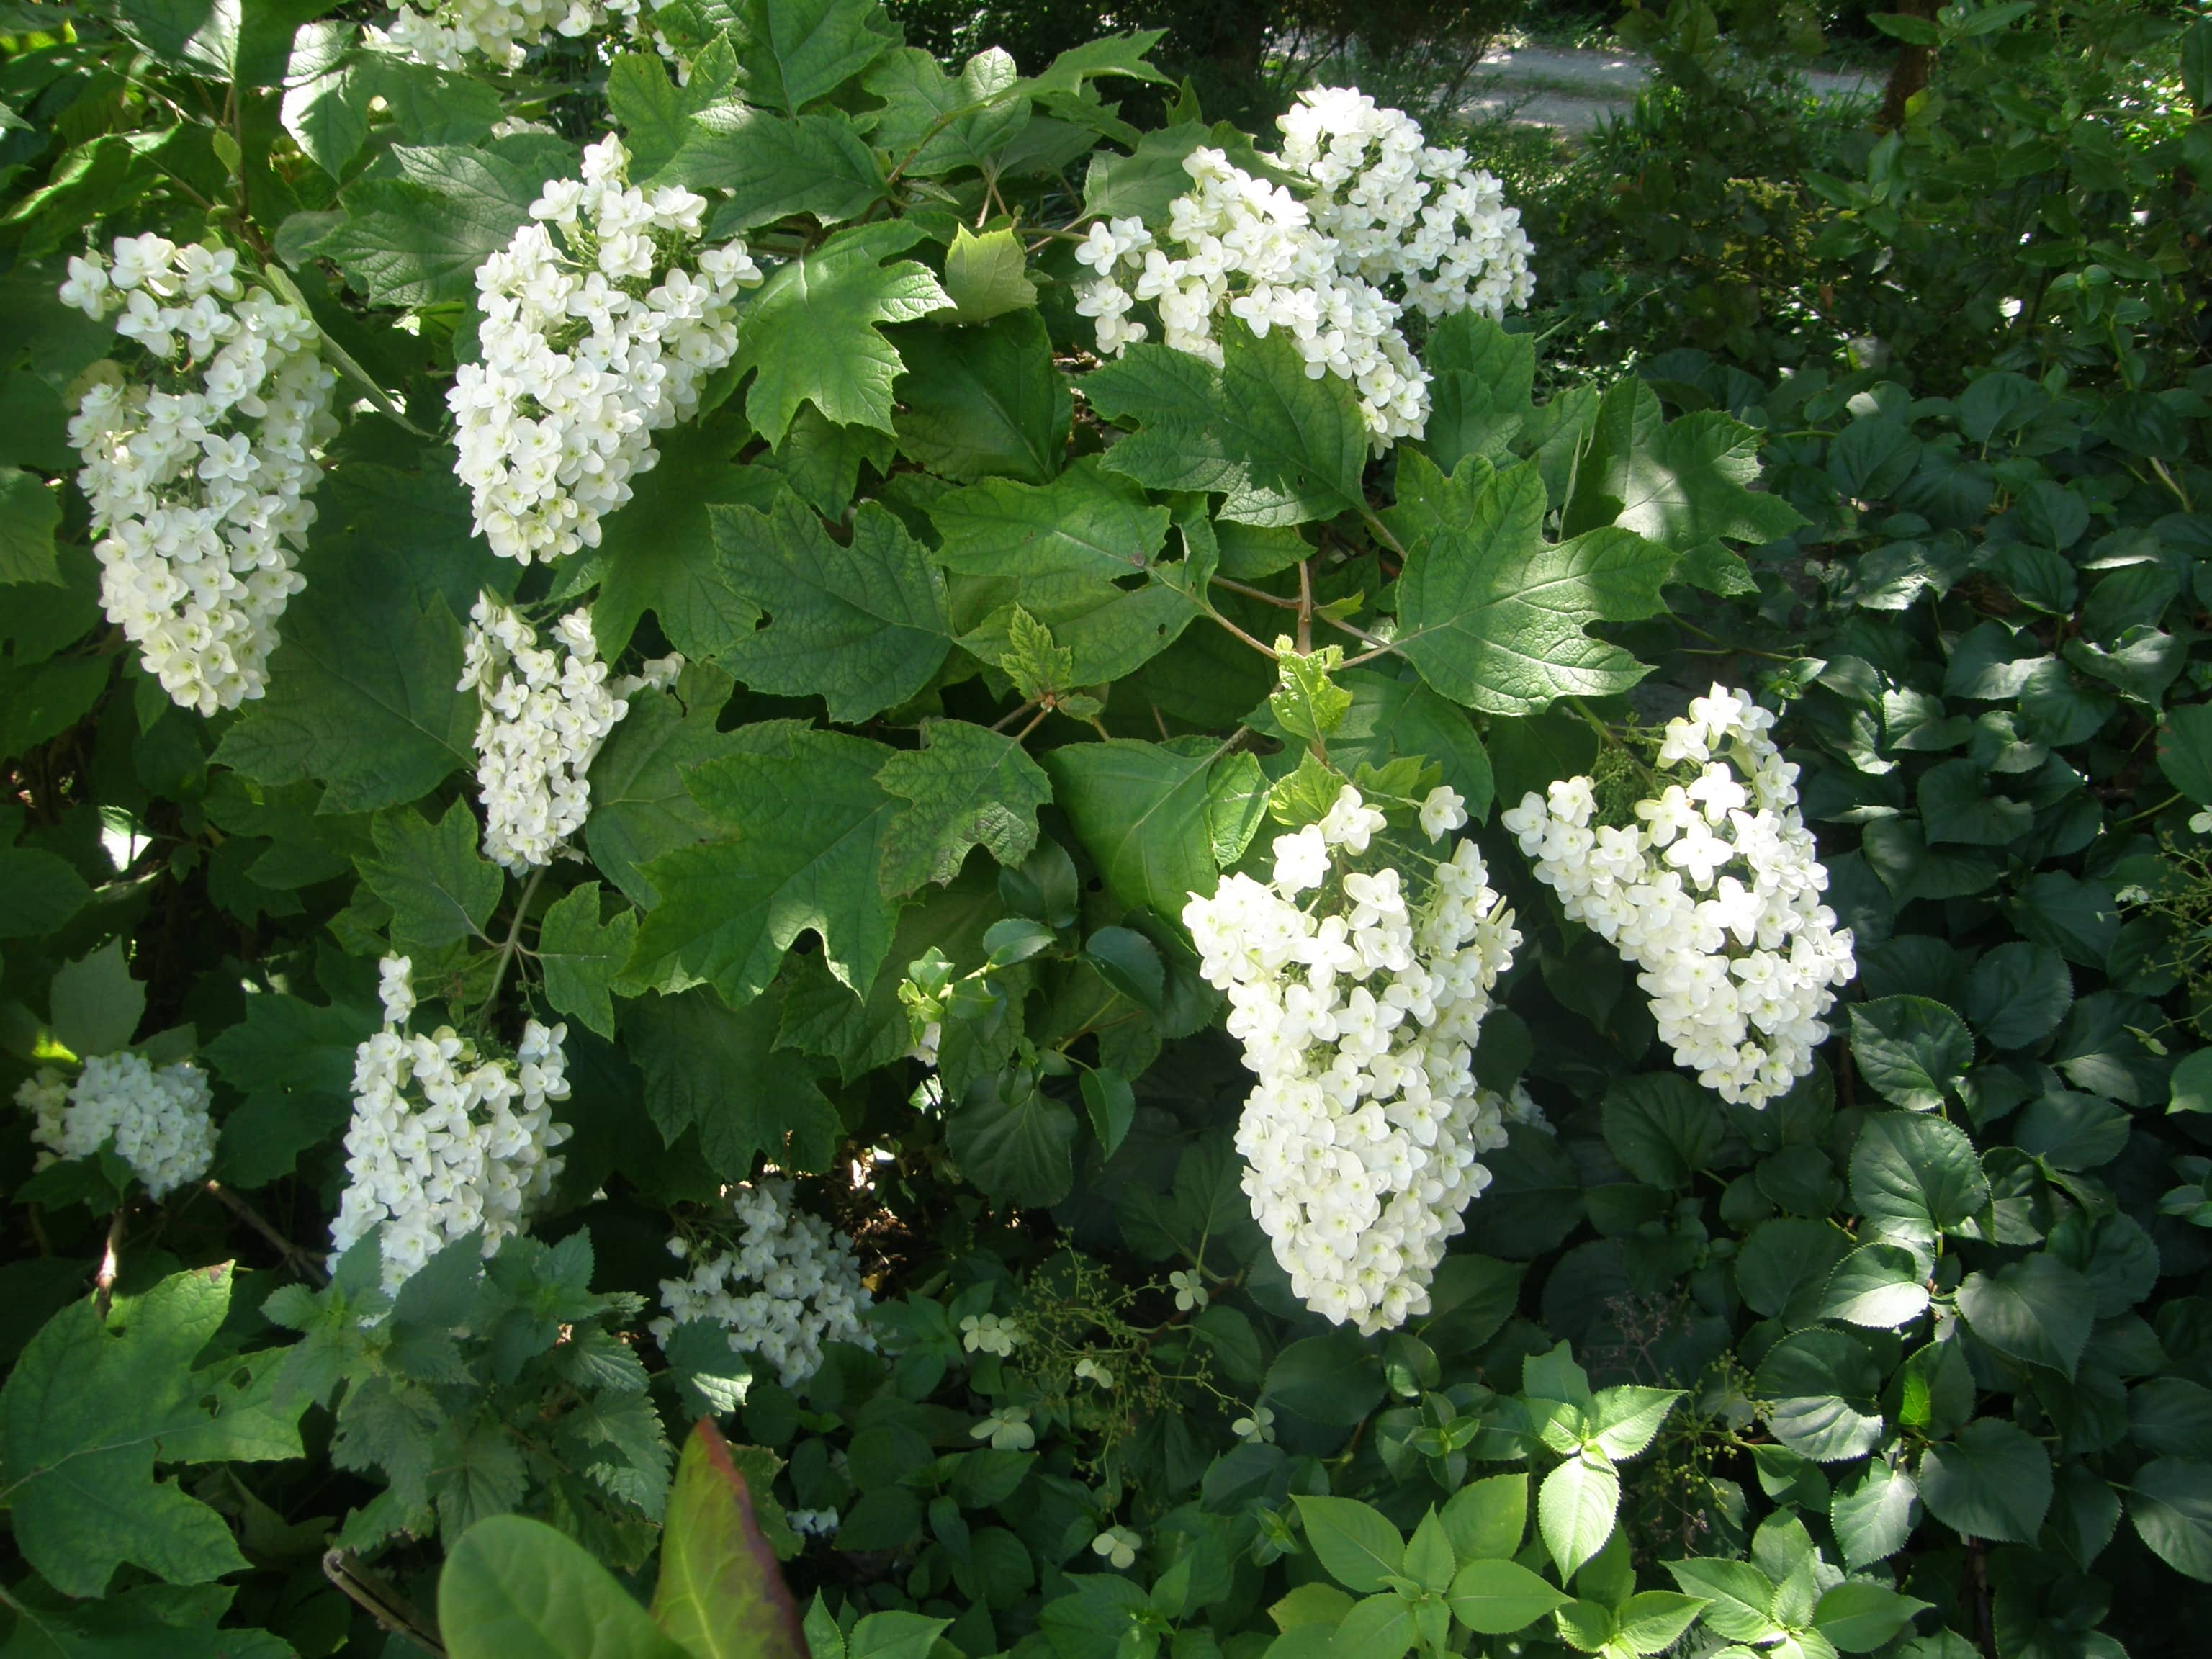 Hortensia pas si acide que a humeur de jardinier - Quand tailler un hortensia ...